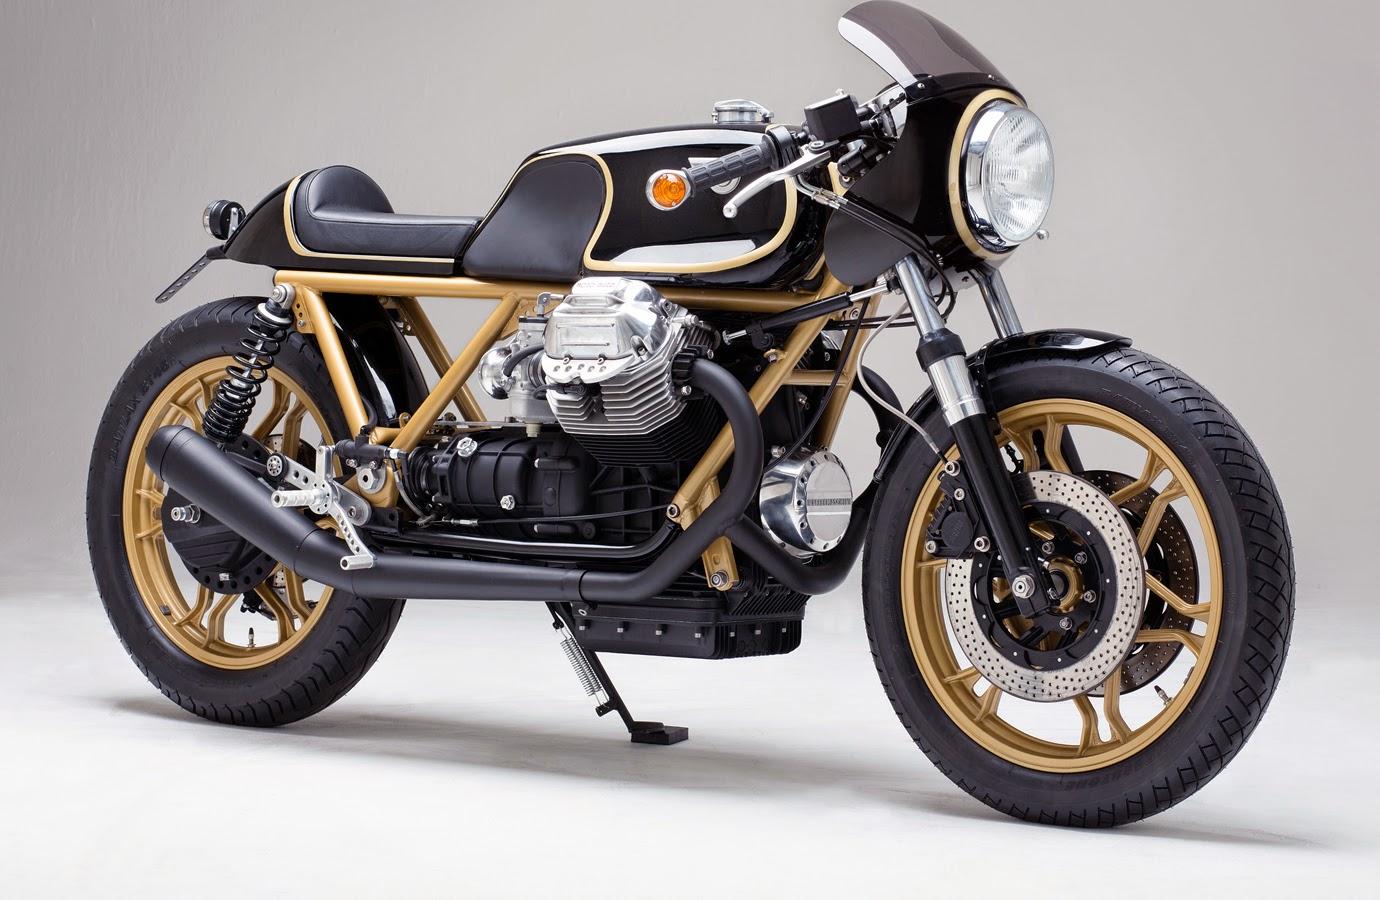 racing caf moto guzzi le mans iii 850 maschine 11 by kaffeemaschine. Black Bedroom Furniture Sets. Home Design Ideas